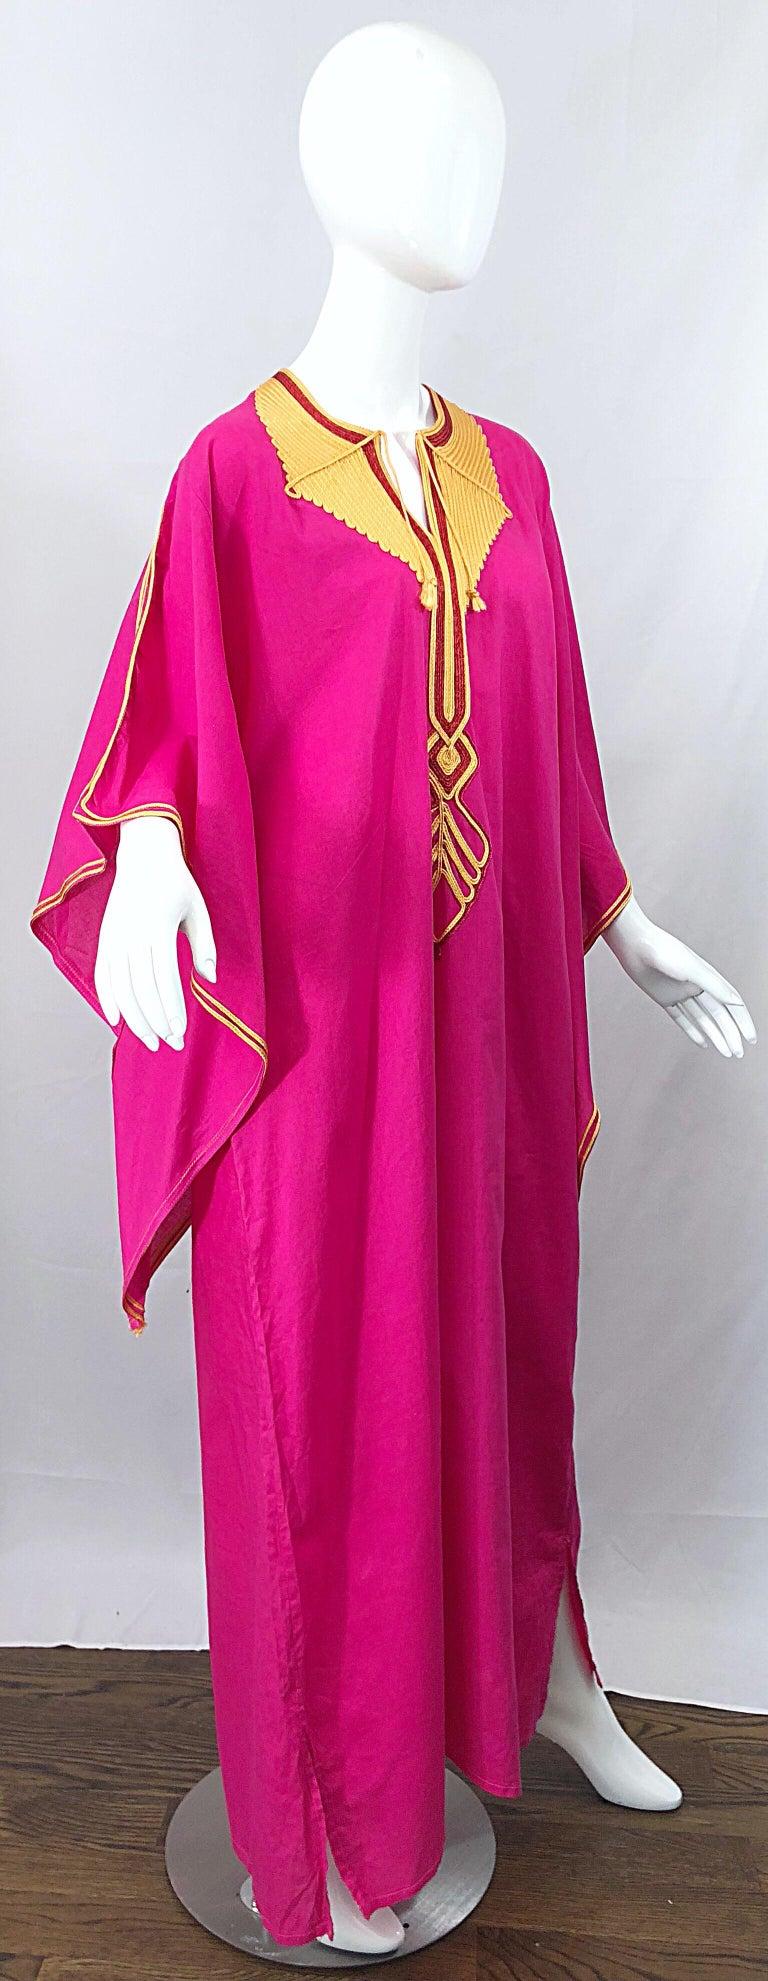 Women's Amazing 1970s Hot Pink + Yellow Angel Sleeve Vintage 70s Kaftan Maxi Dress For Sale